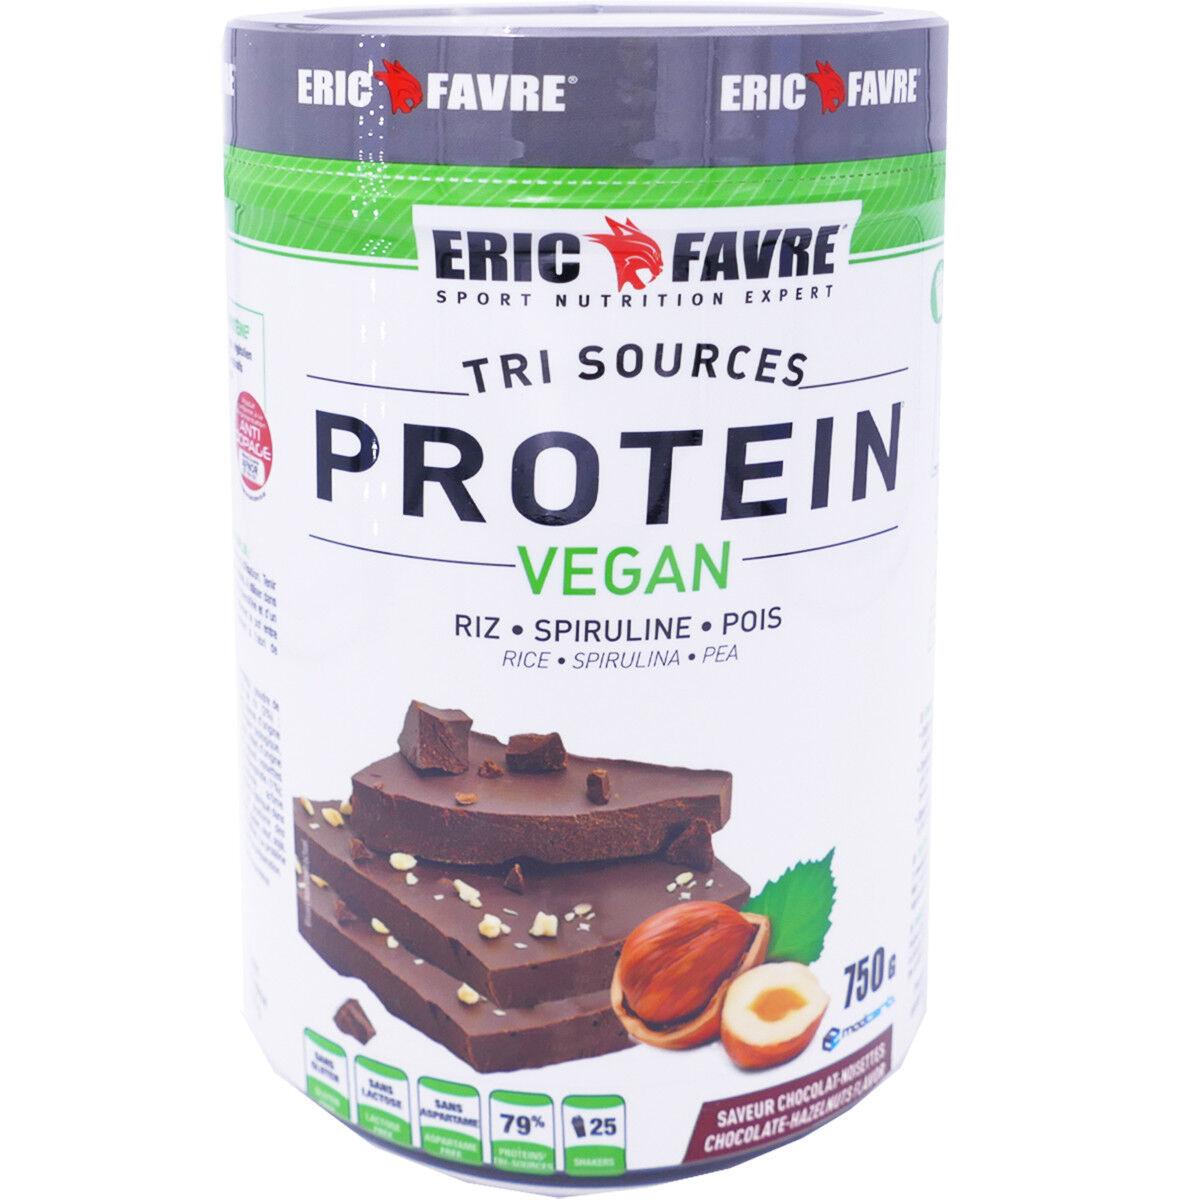 Eric favre protein vegan chocolat noisettes 750g